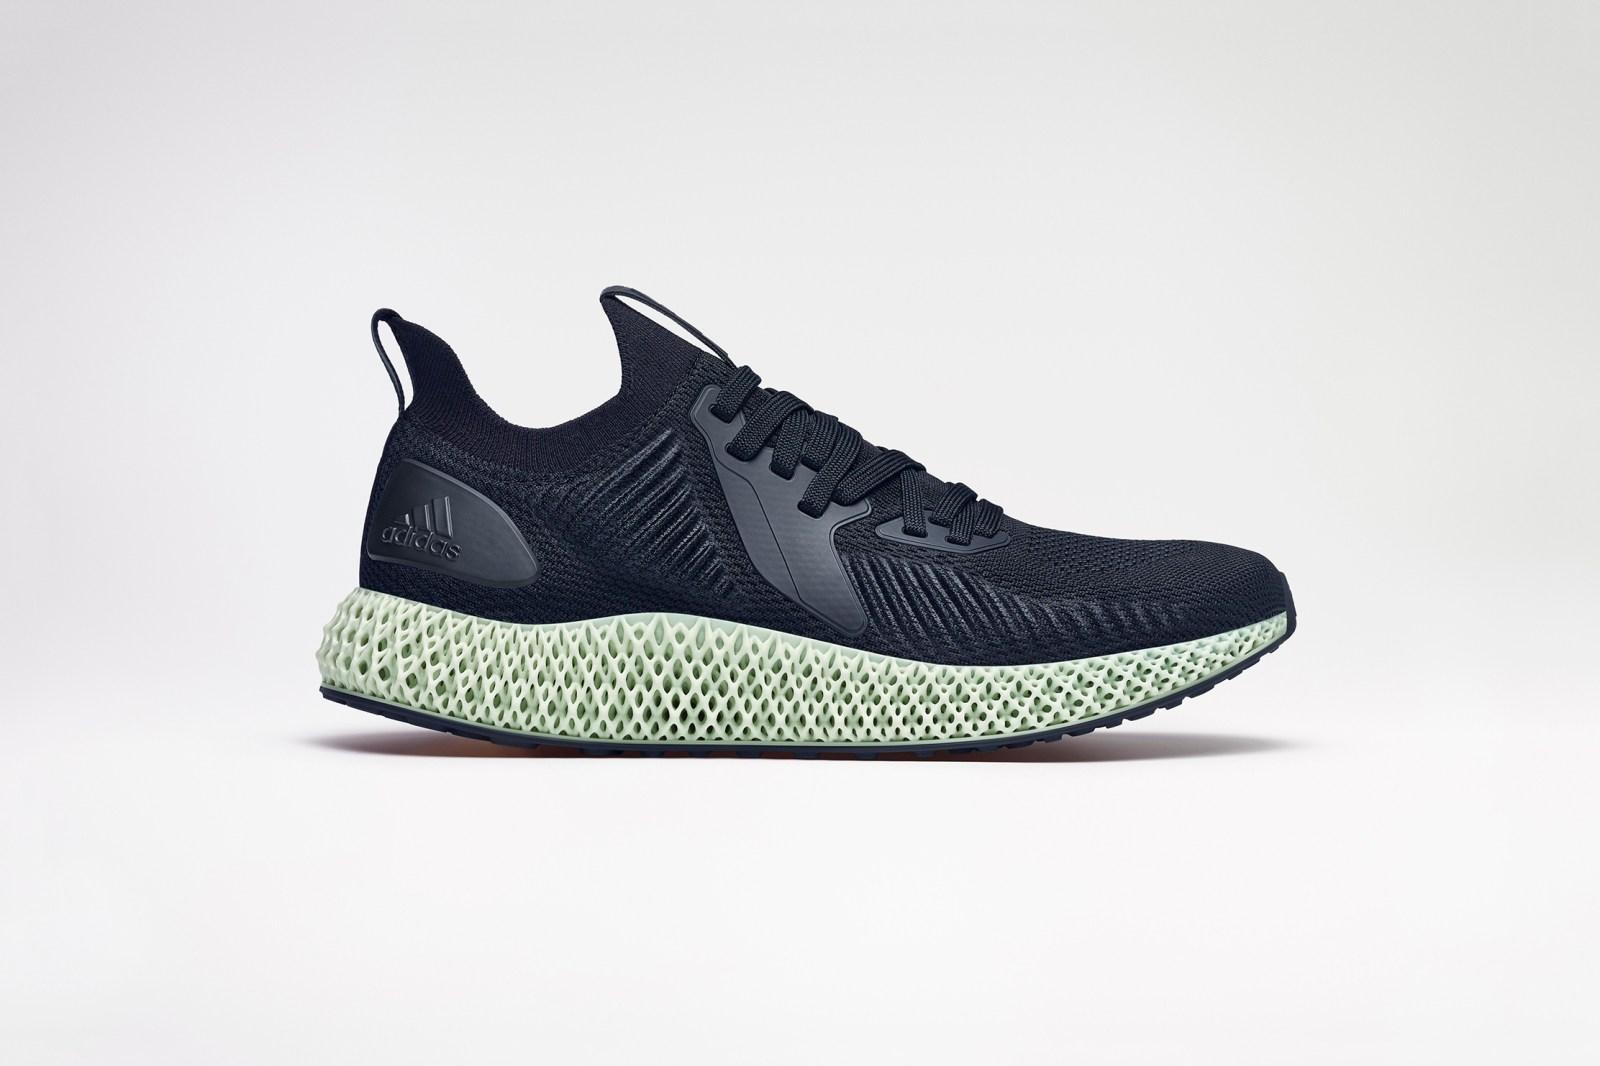 sacai x Nike Blazer Mid 及 fragment design x U.E 空冷服等本週不容錯過的 7 項新品發售